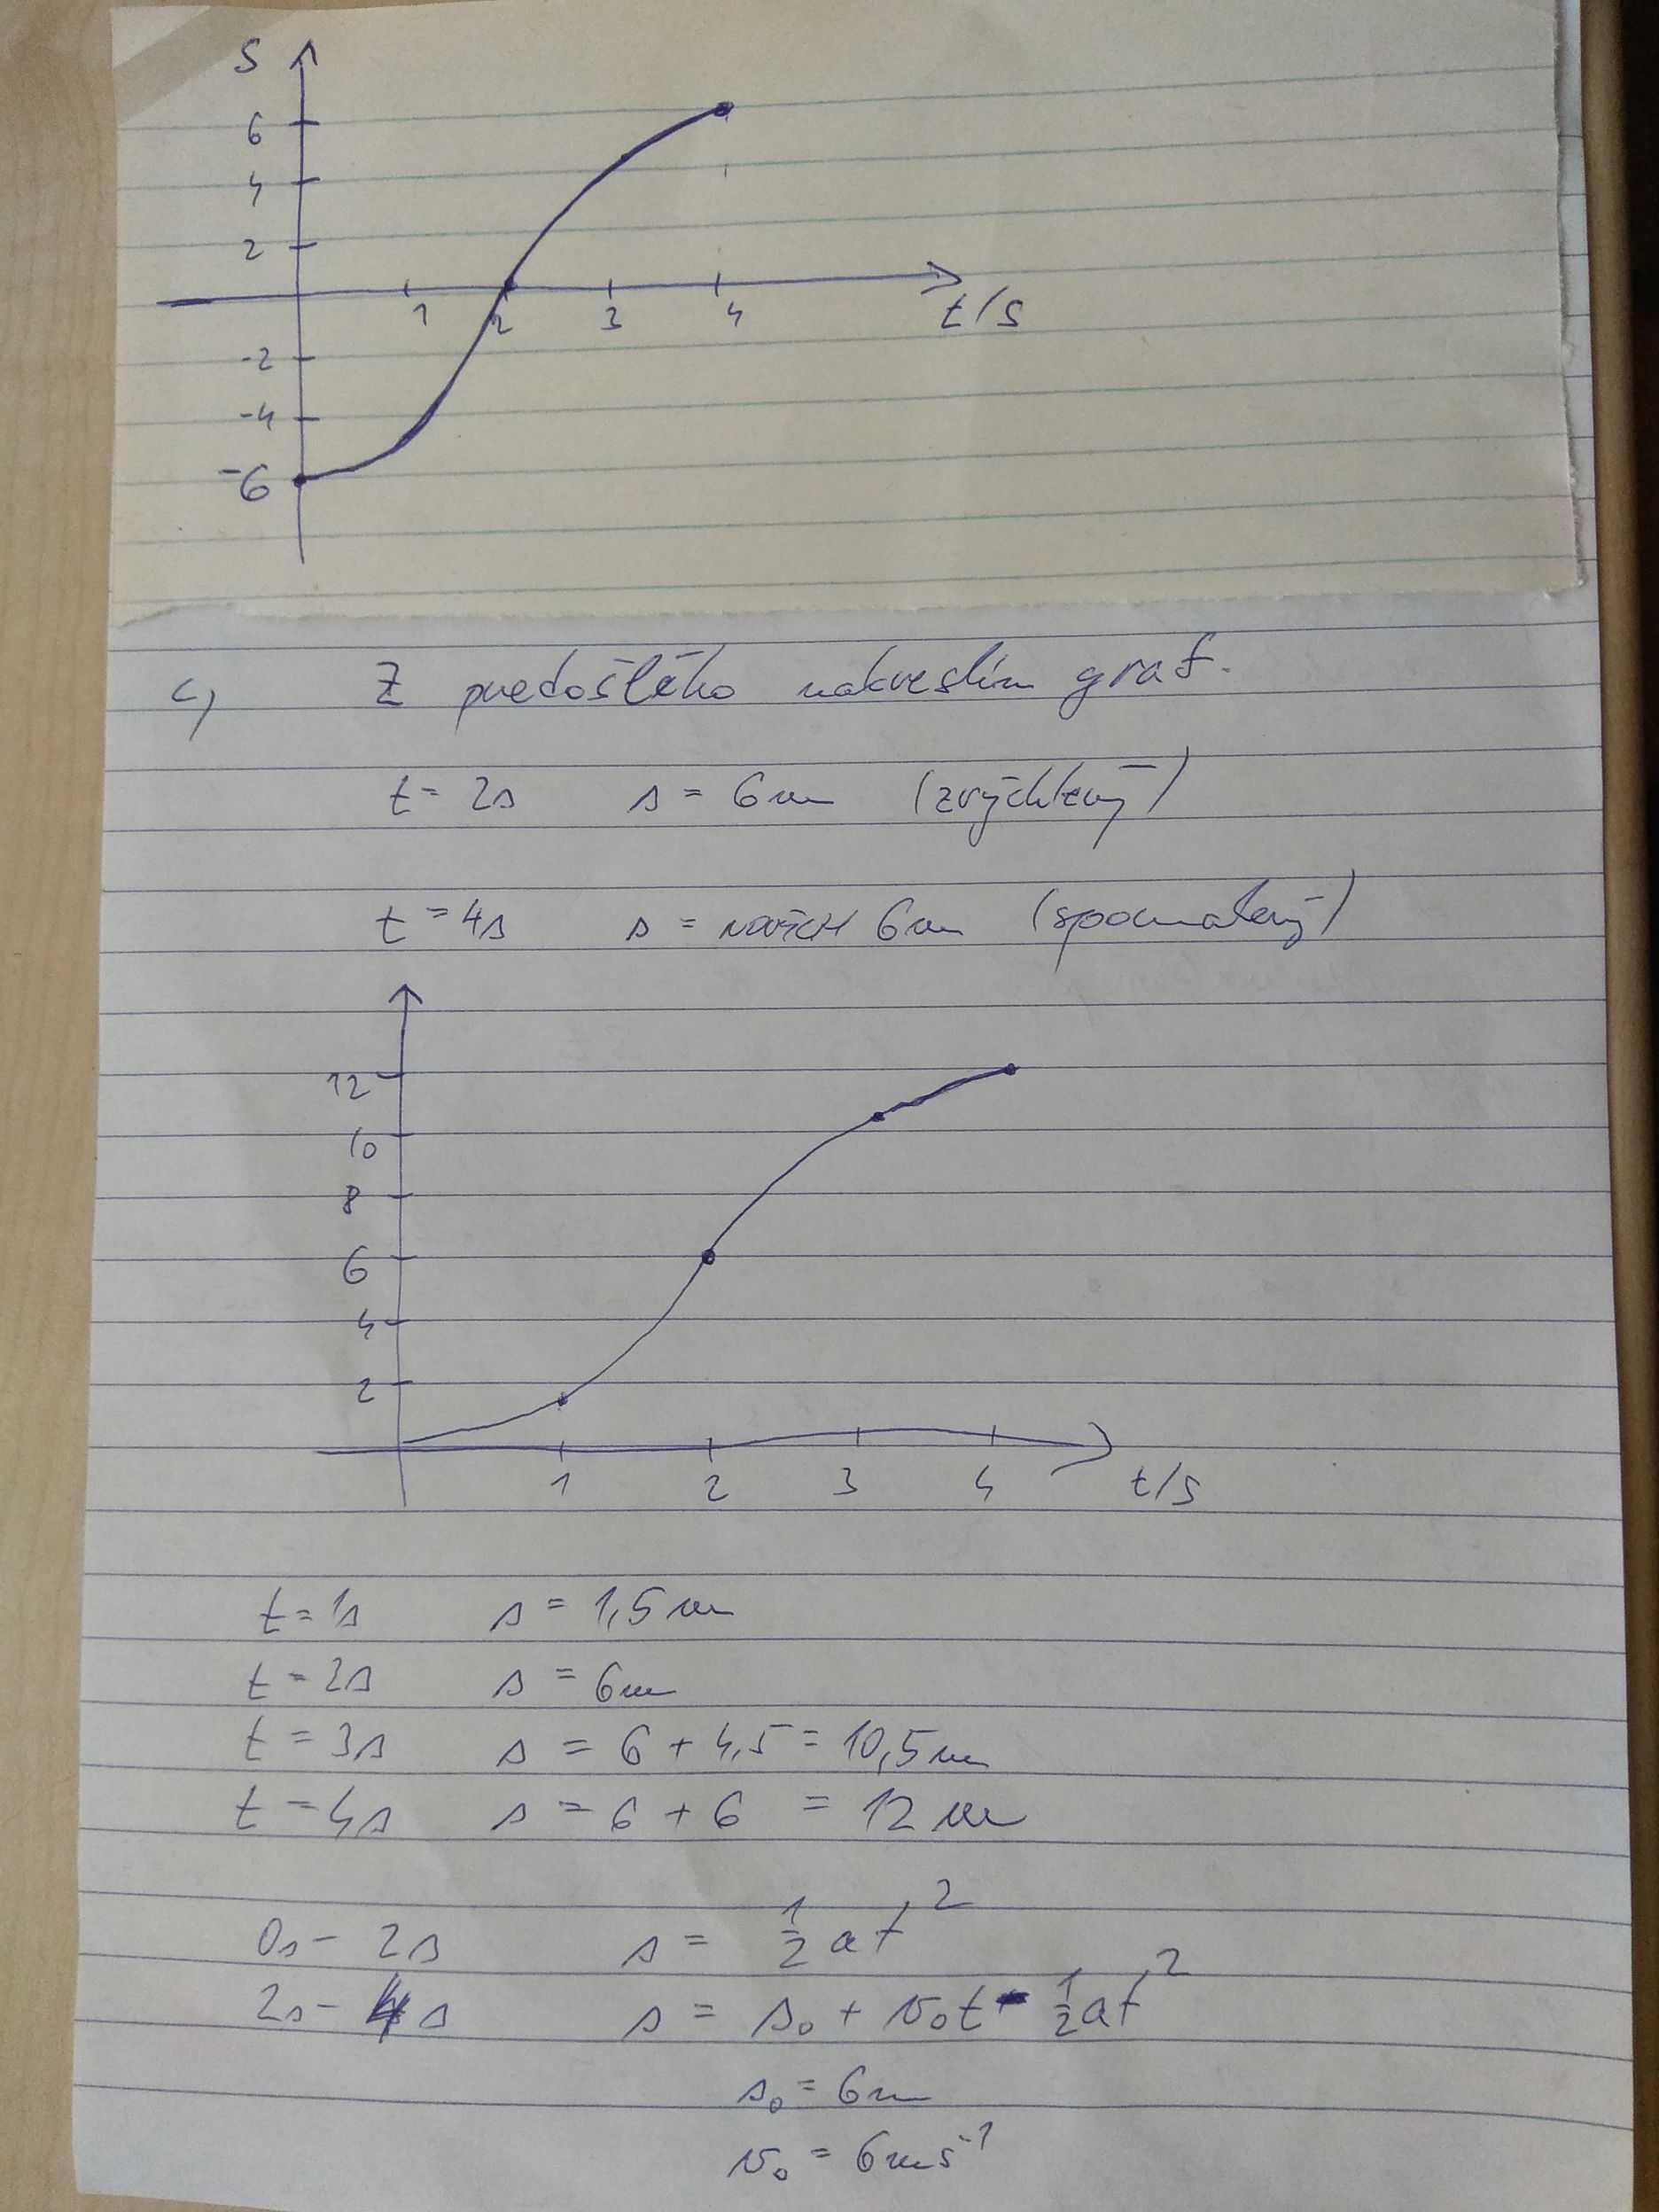 http://forum.matematika.cz/upload3/img/2018-06/44968_riesenie1b.jpg